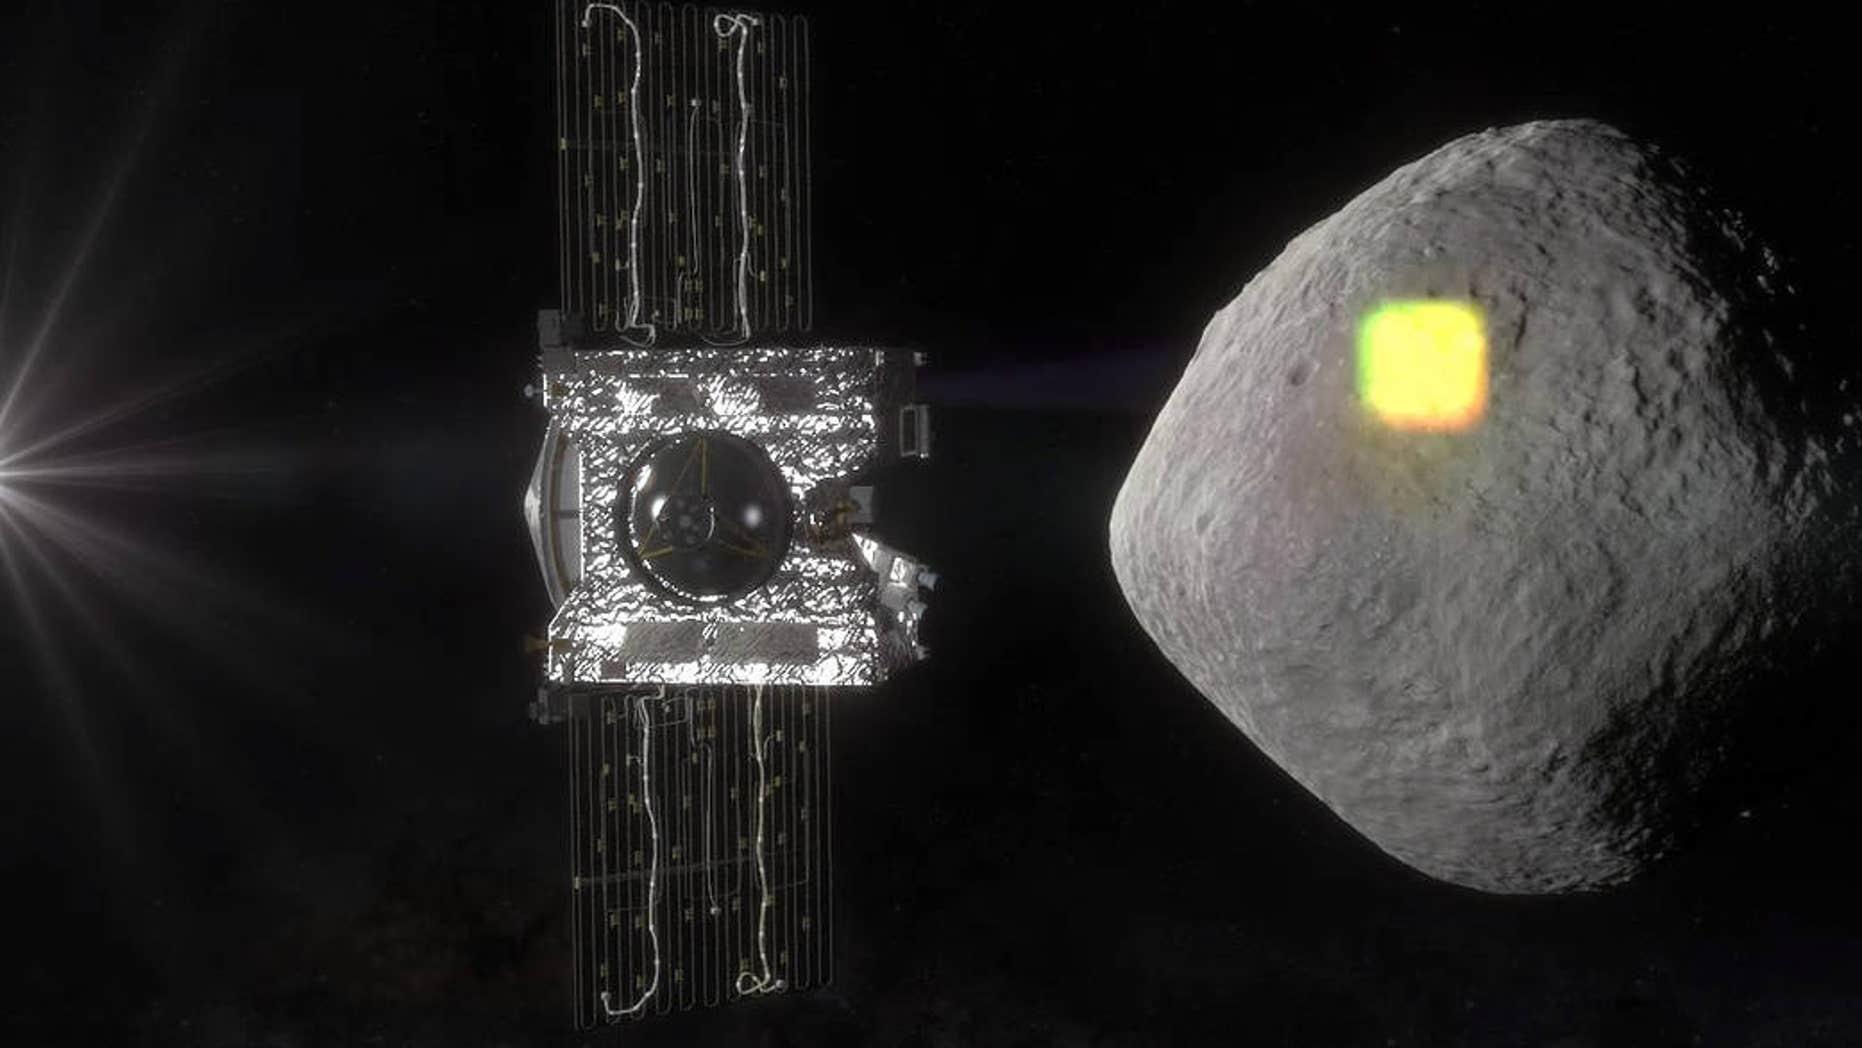 Artist's impression of OSIRIS-REx and asteroid Bennu. (NASA/Goddard/University of Arizona)